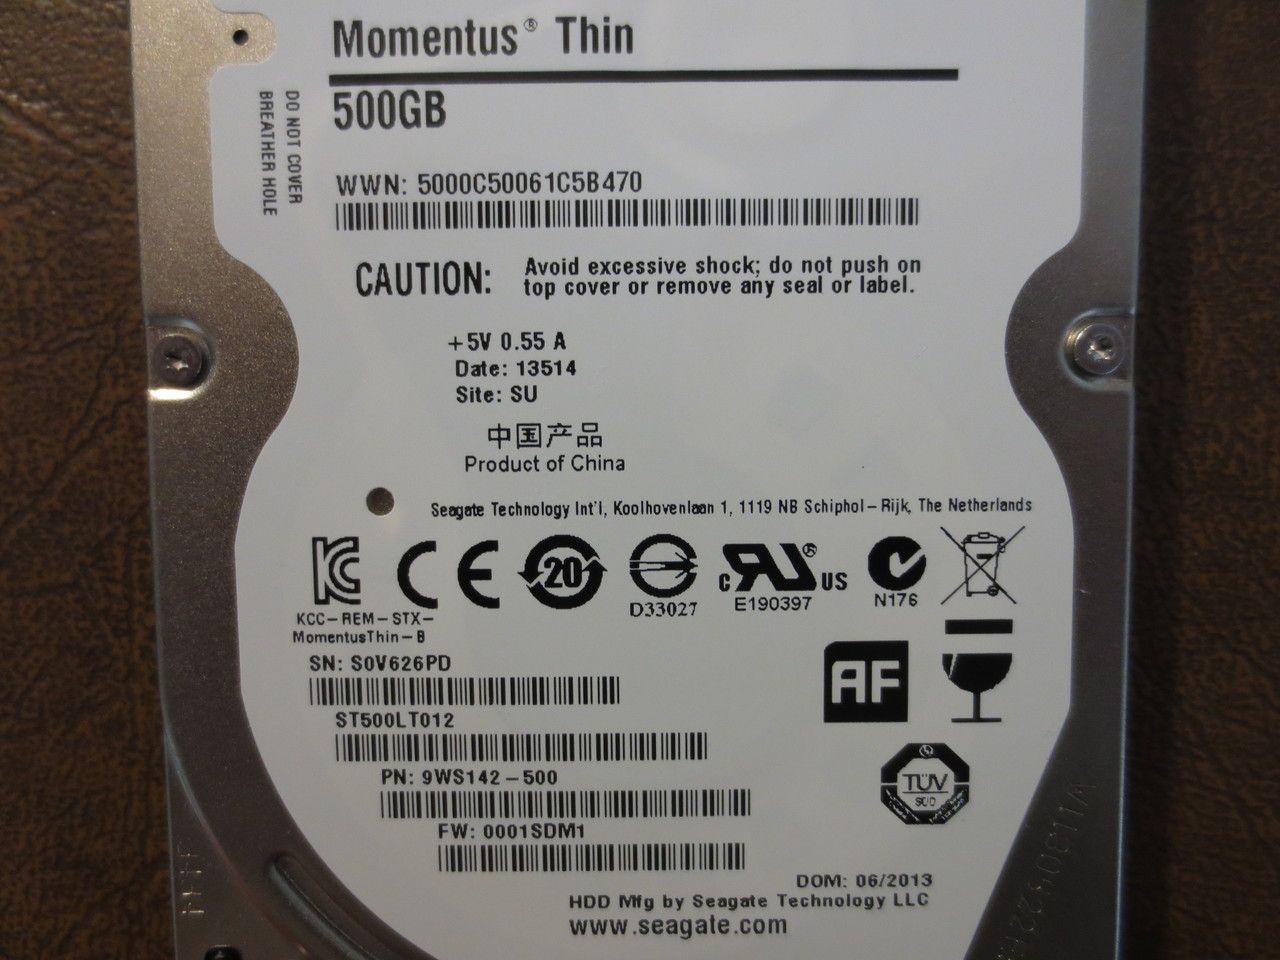 Seagate St500lt012 9ws142 500 Fw 0001sdm1 Su 500gb Sata Effective Electronics Seagate Computer Repair Hard Disk Drive